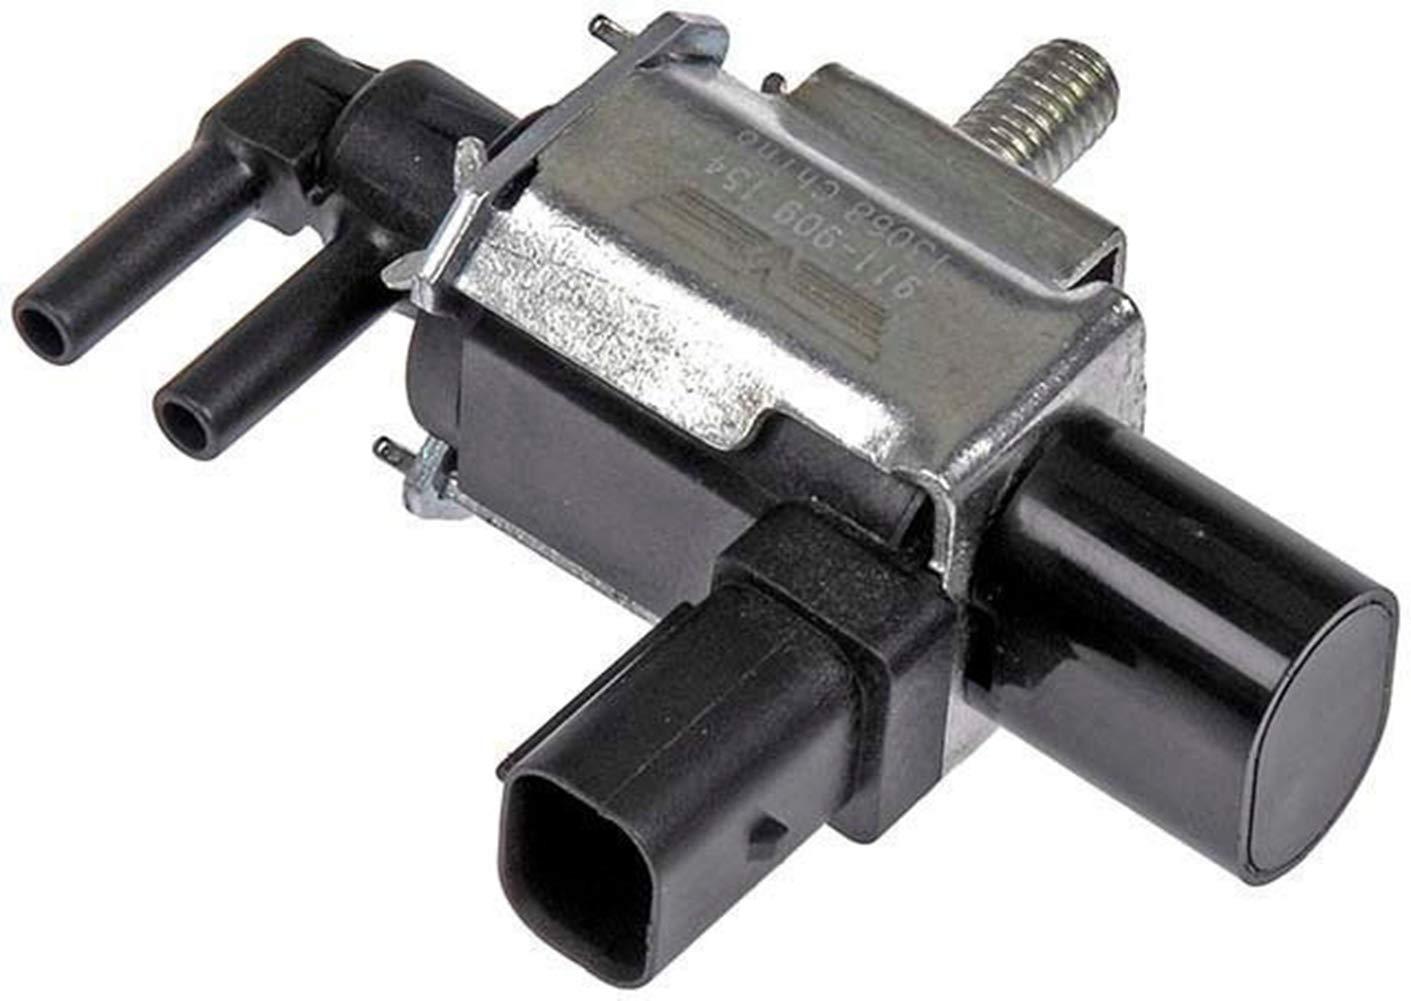 LF15-18-741 For Mazda 3 5 6 CX-7 2.0L 2.5L 2.3L Bernard Bertha Intake Manifold Runner Control Valve 911-909//911909